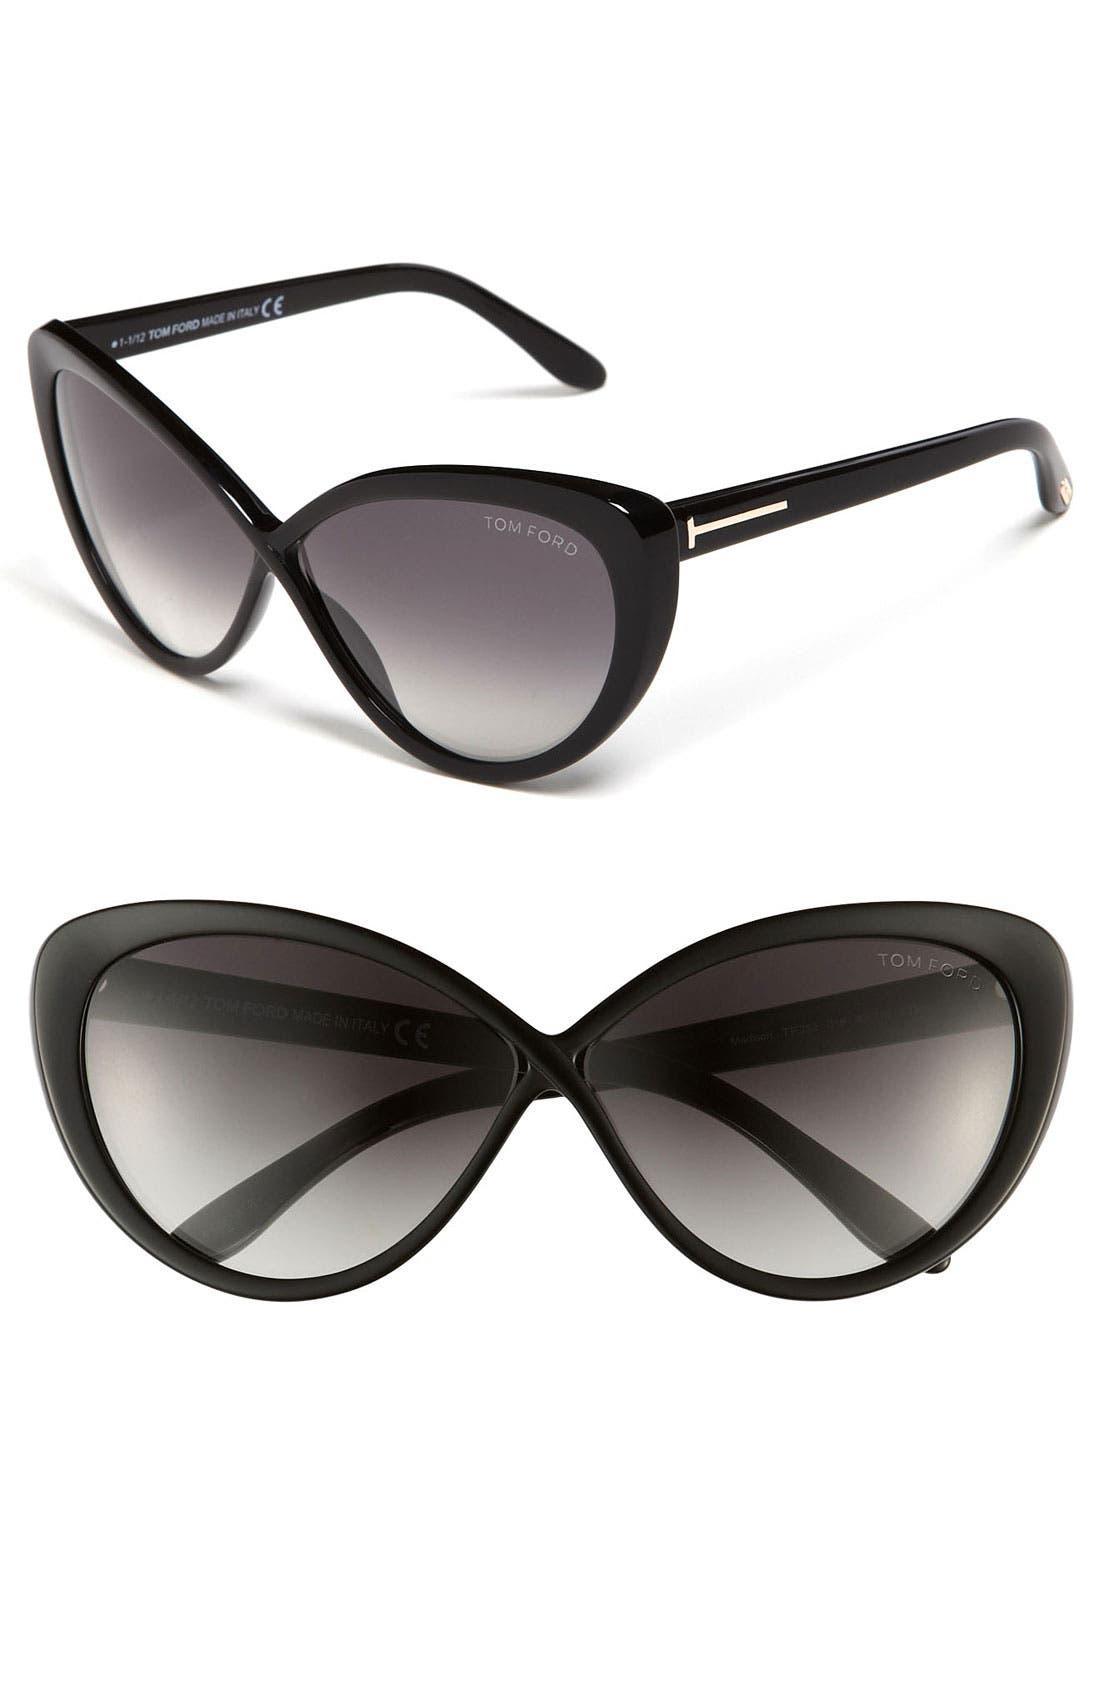 Alternate Image 1 Selected - Tom Ford 'Madison' 63mm Retro Sunglasses